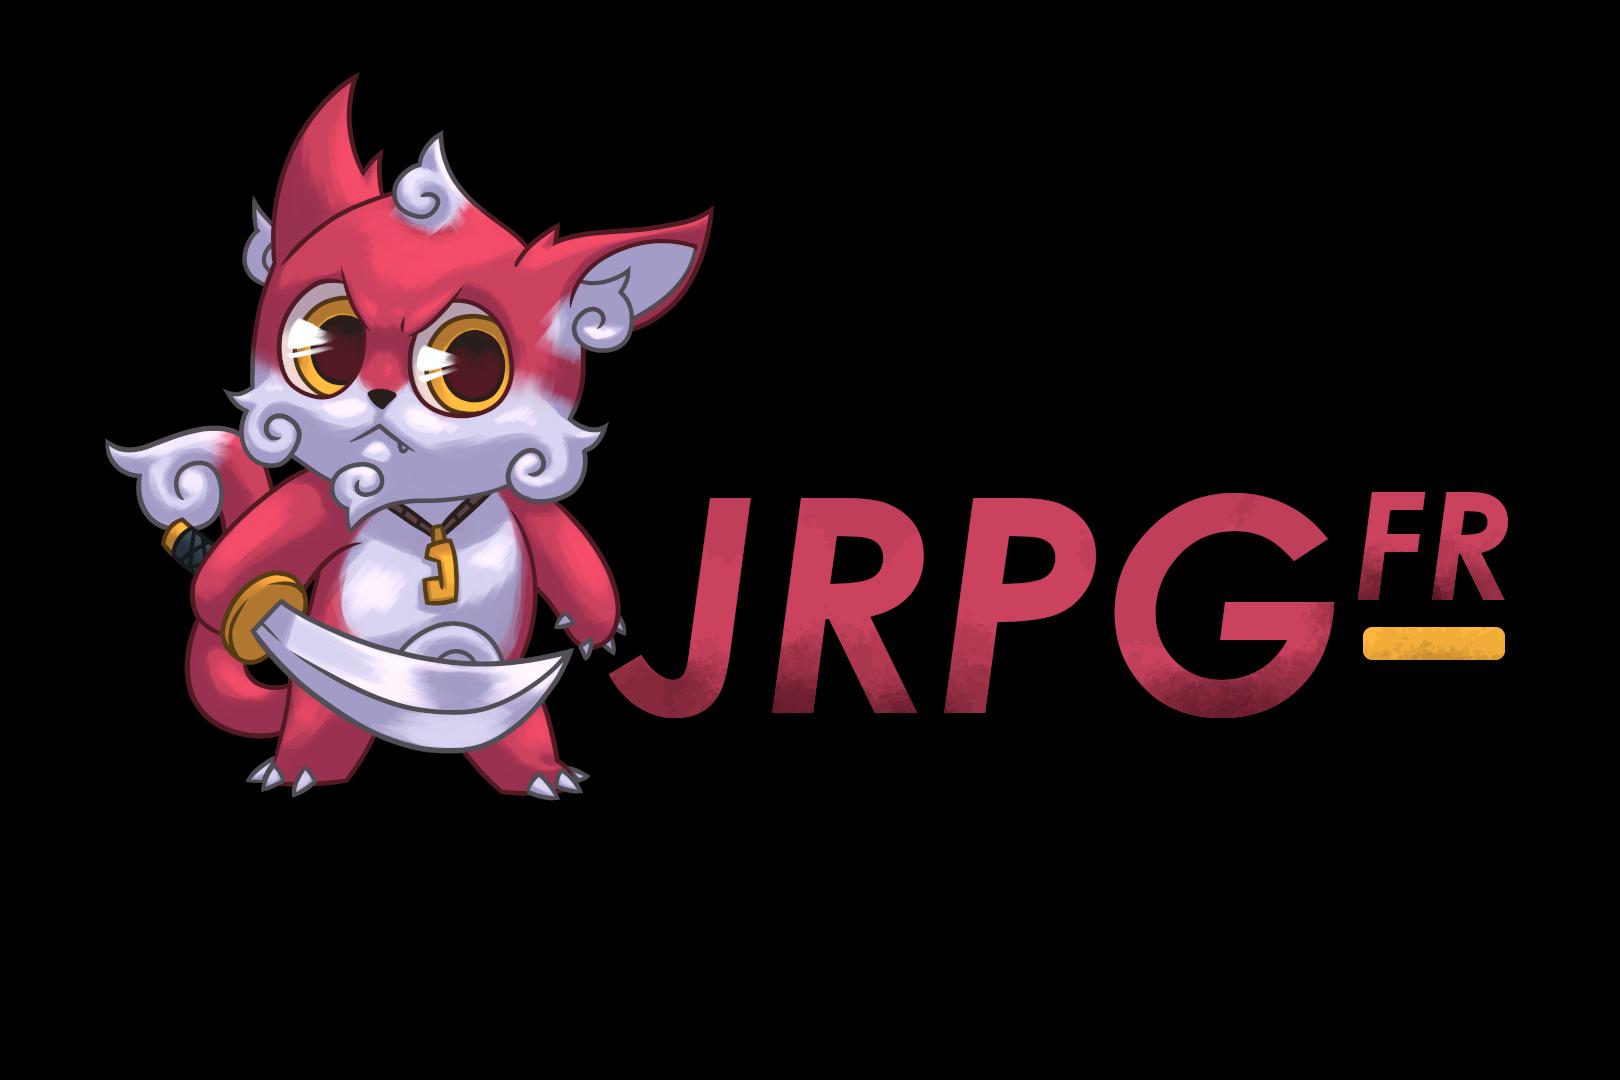 JRPGFR